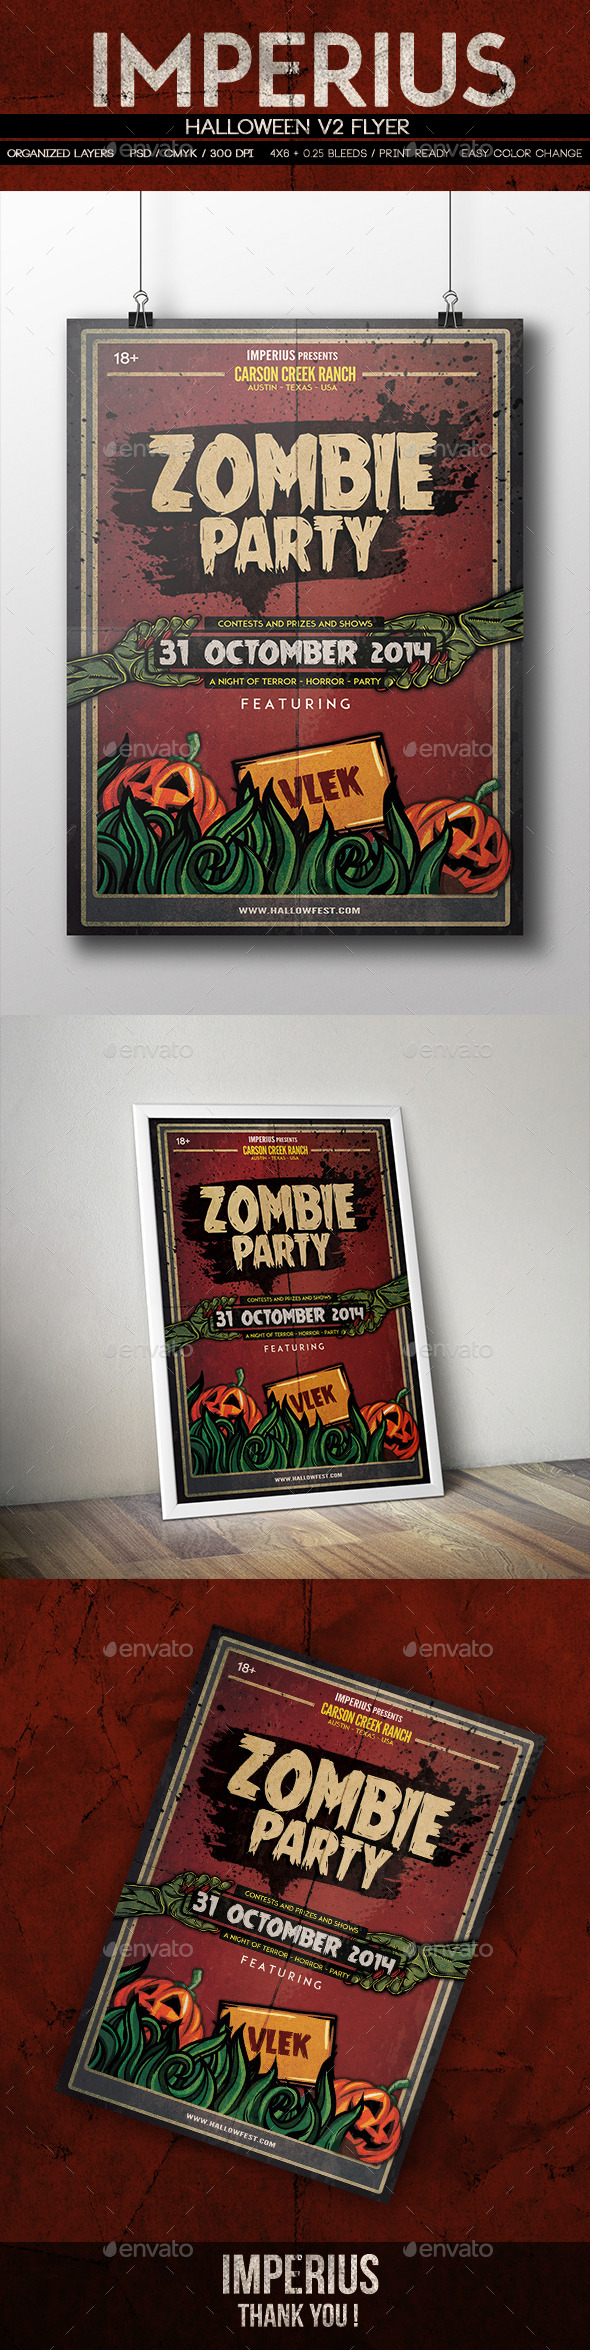 GraphicRiver Halloween V2 Flyer 8843416